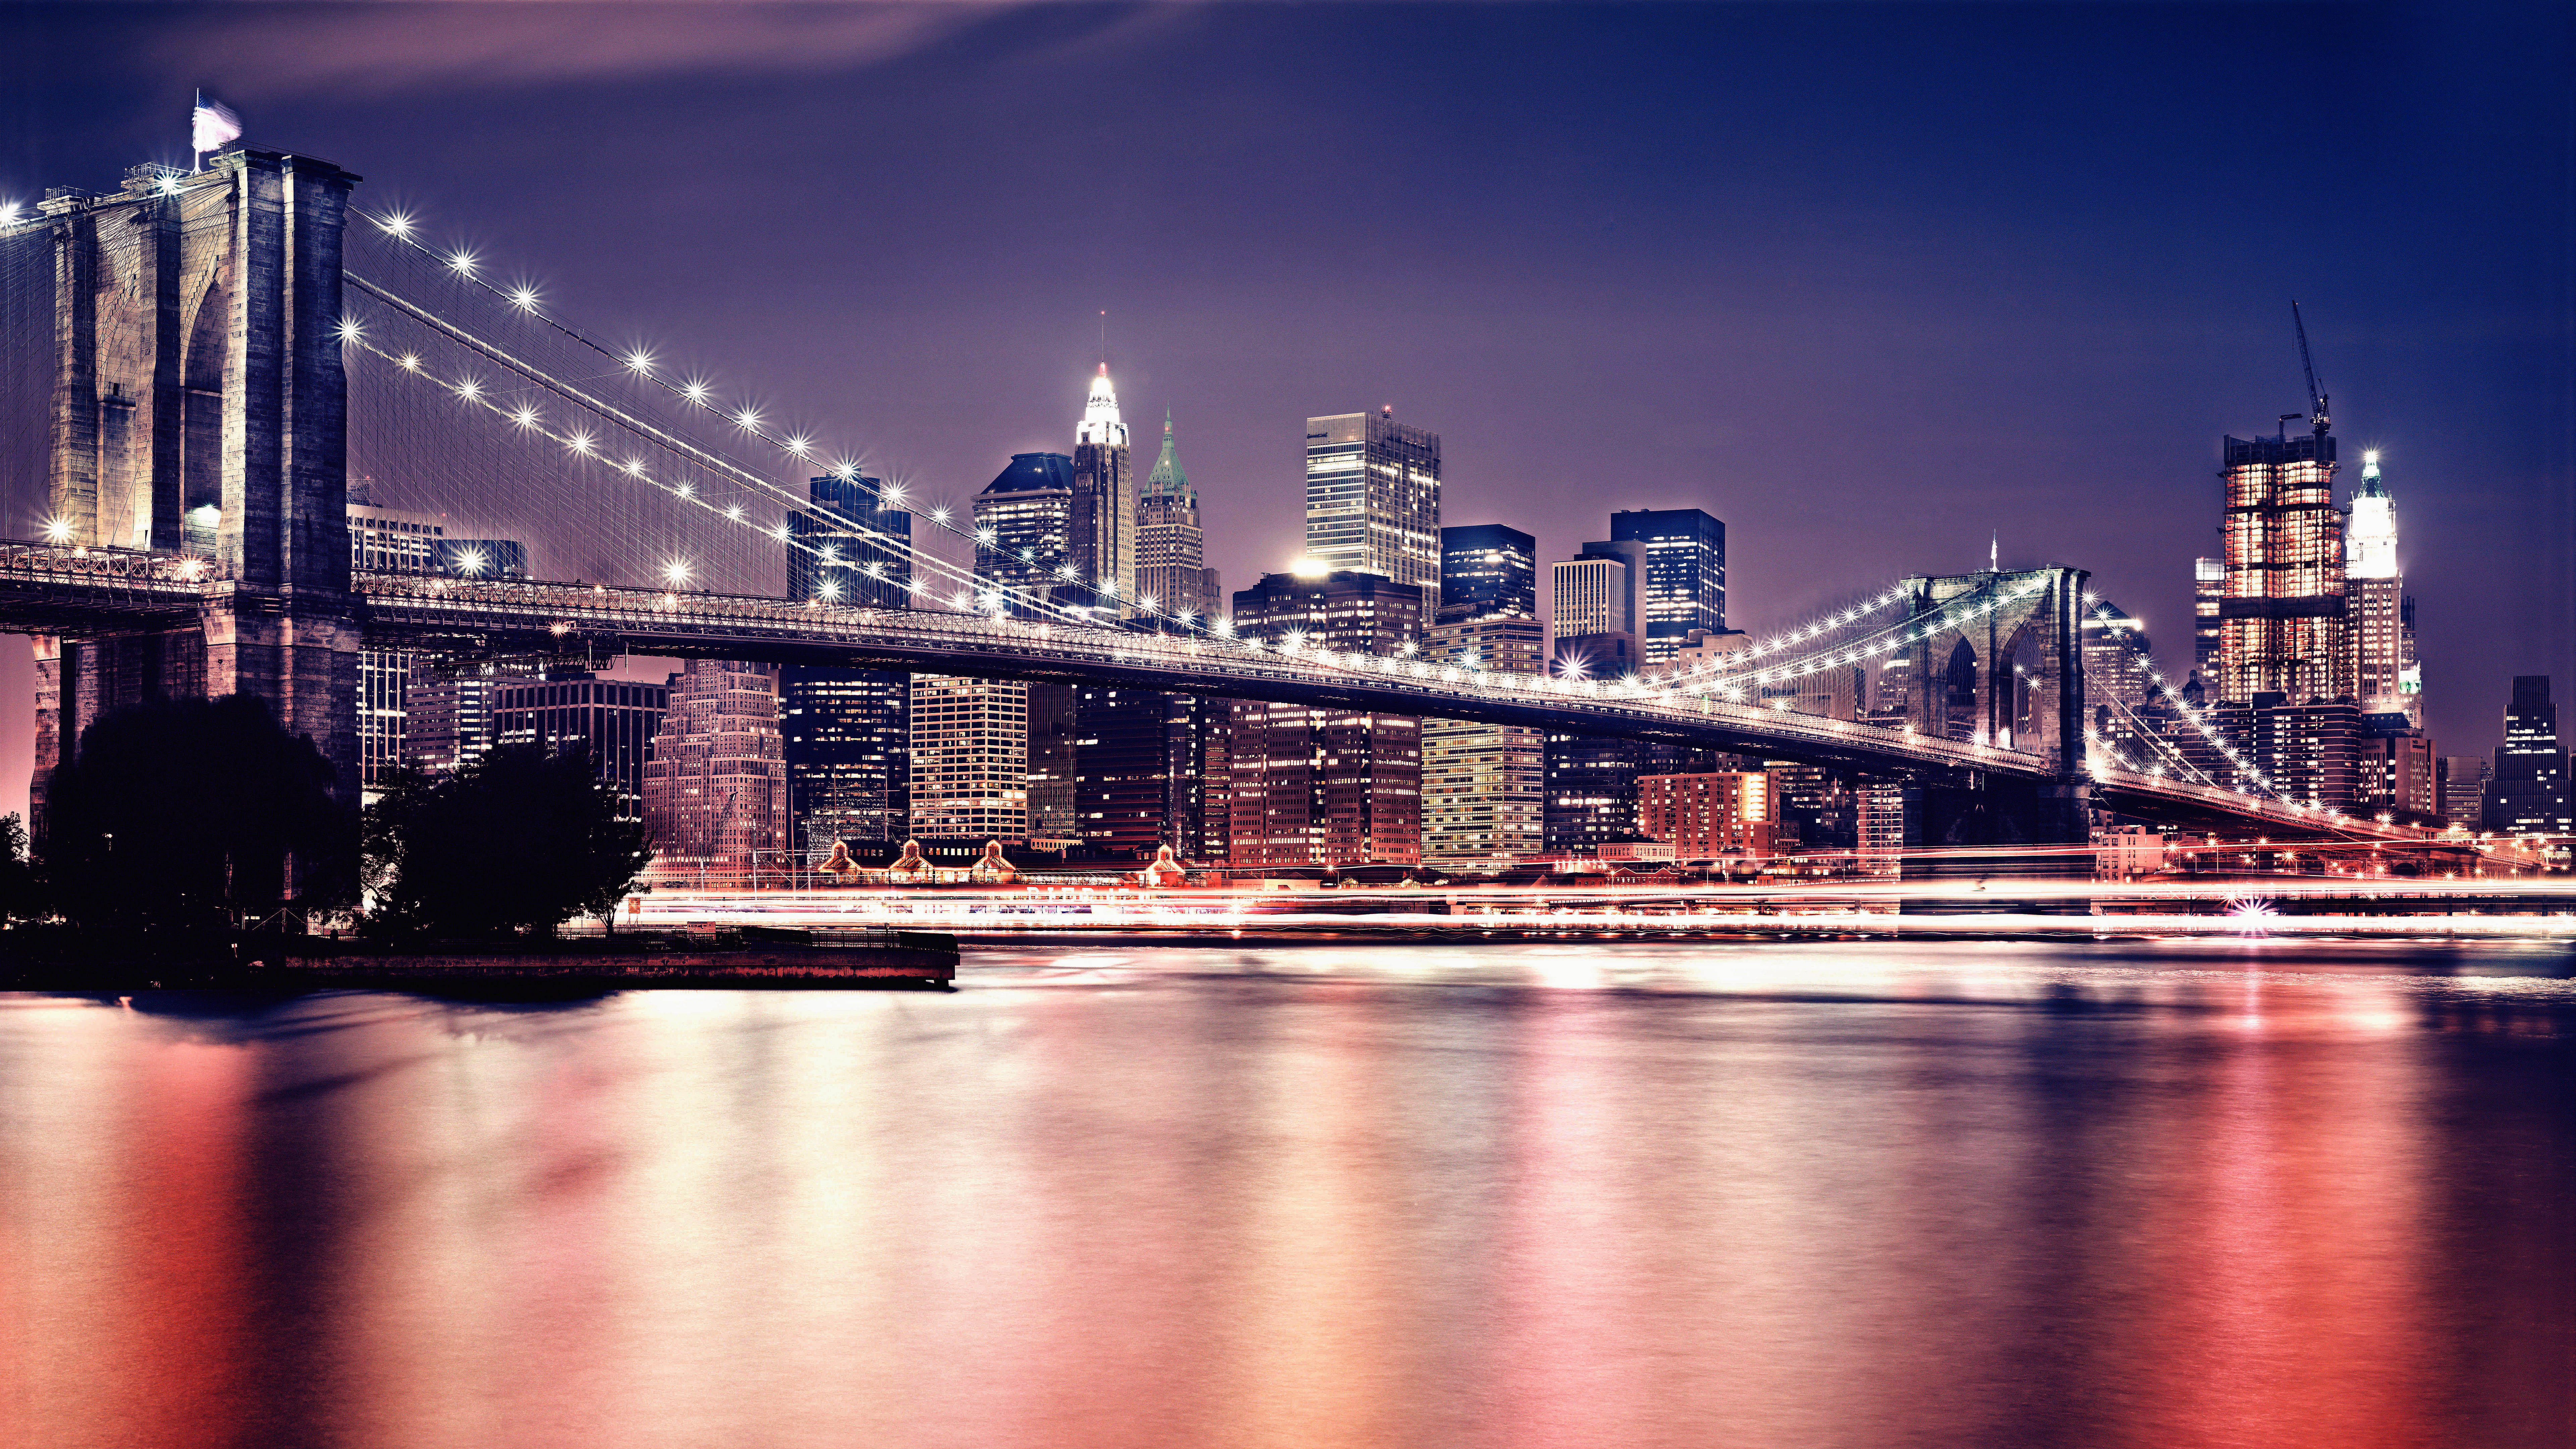 City Cityscape Urban Night Photography Street New York City Bridge Building Manhattan Brooklyn Bridg 7680x4320